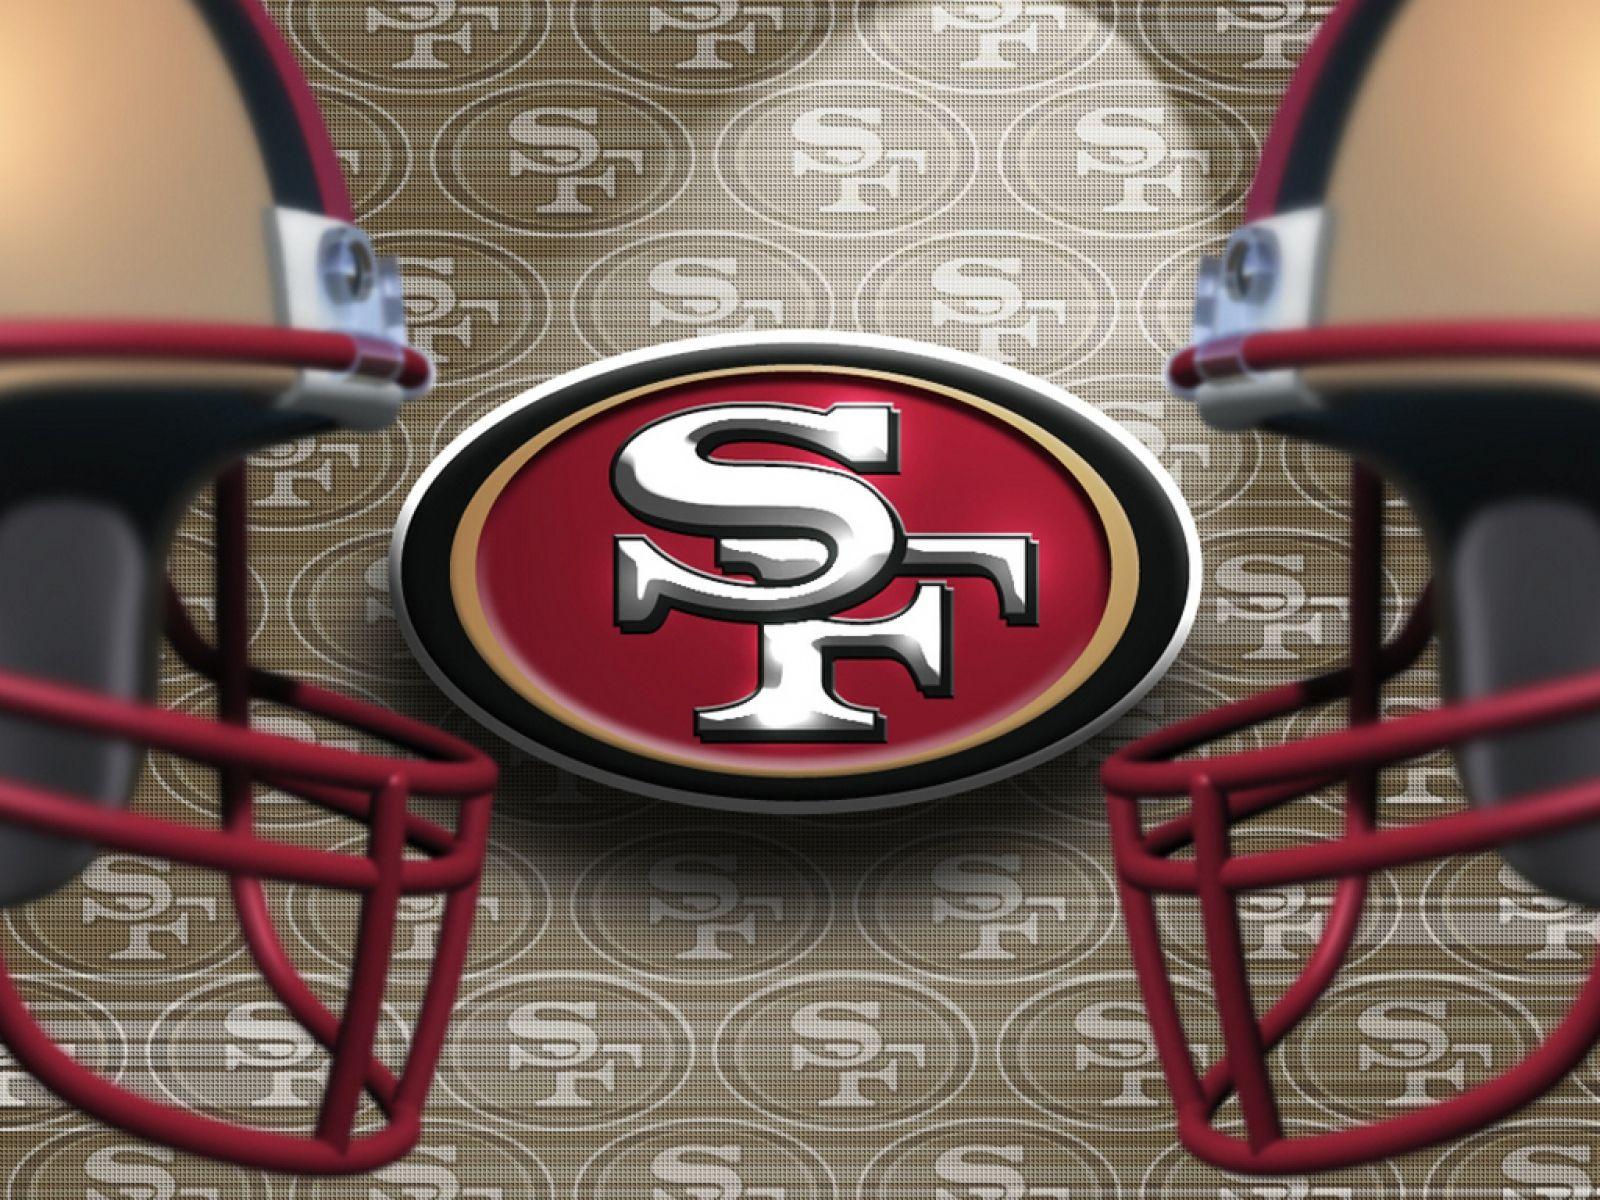 49ers old logo | San Francisco 49ers | Pinterest | Logos